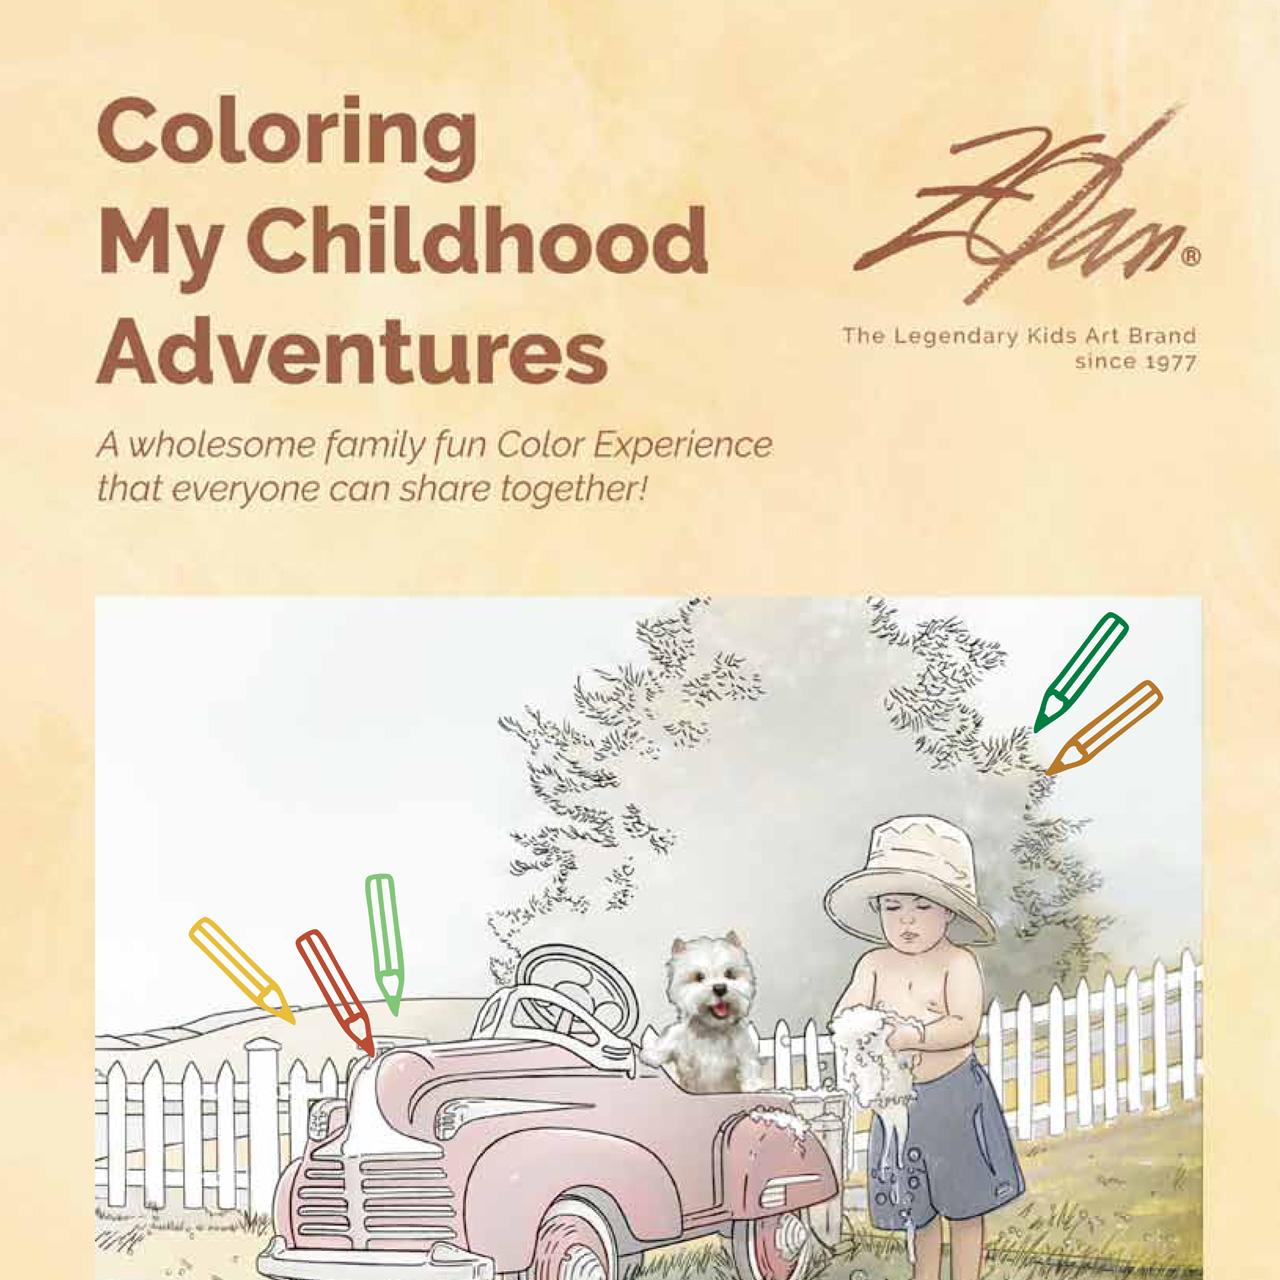 Donald Zolan Children's Brand